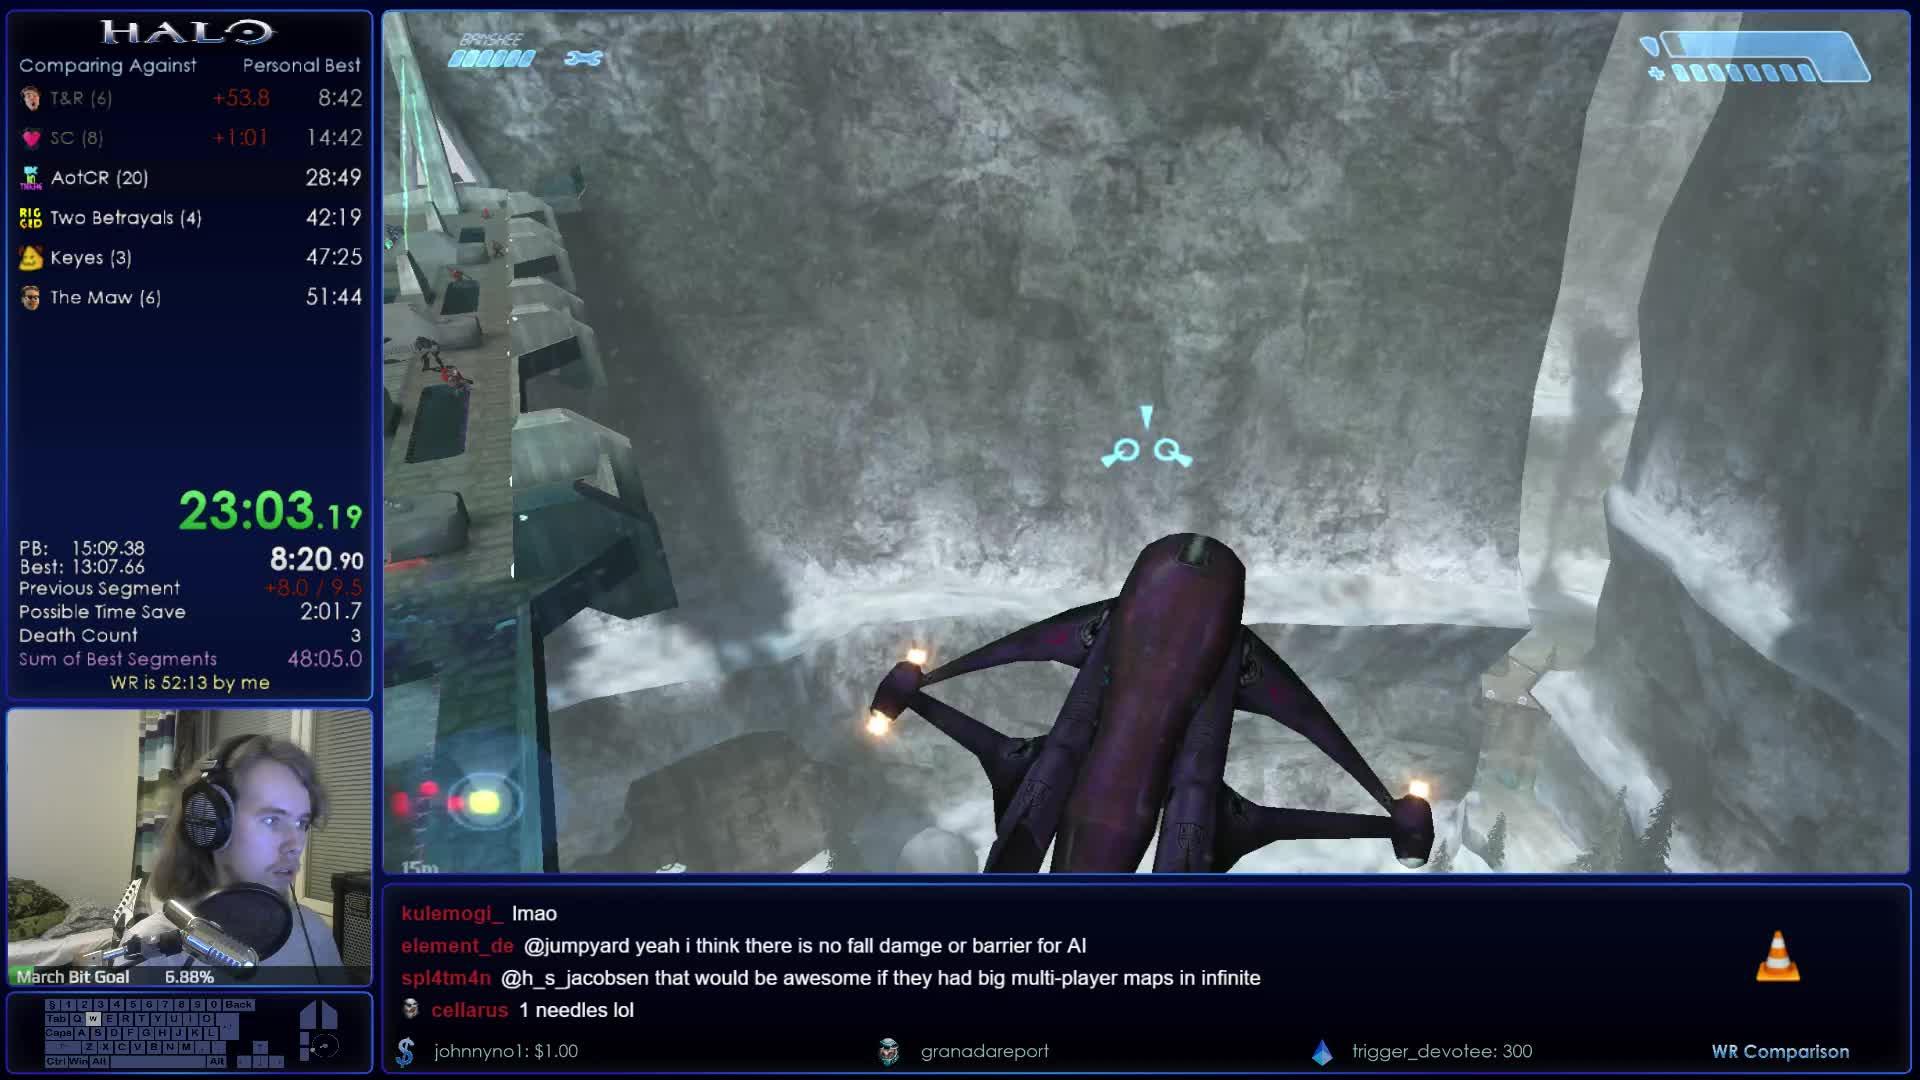 GarishGoblin - Halo Legendary Speedruns w/ Garish || 1080p60